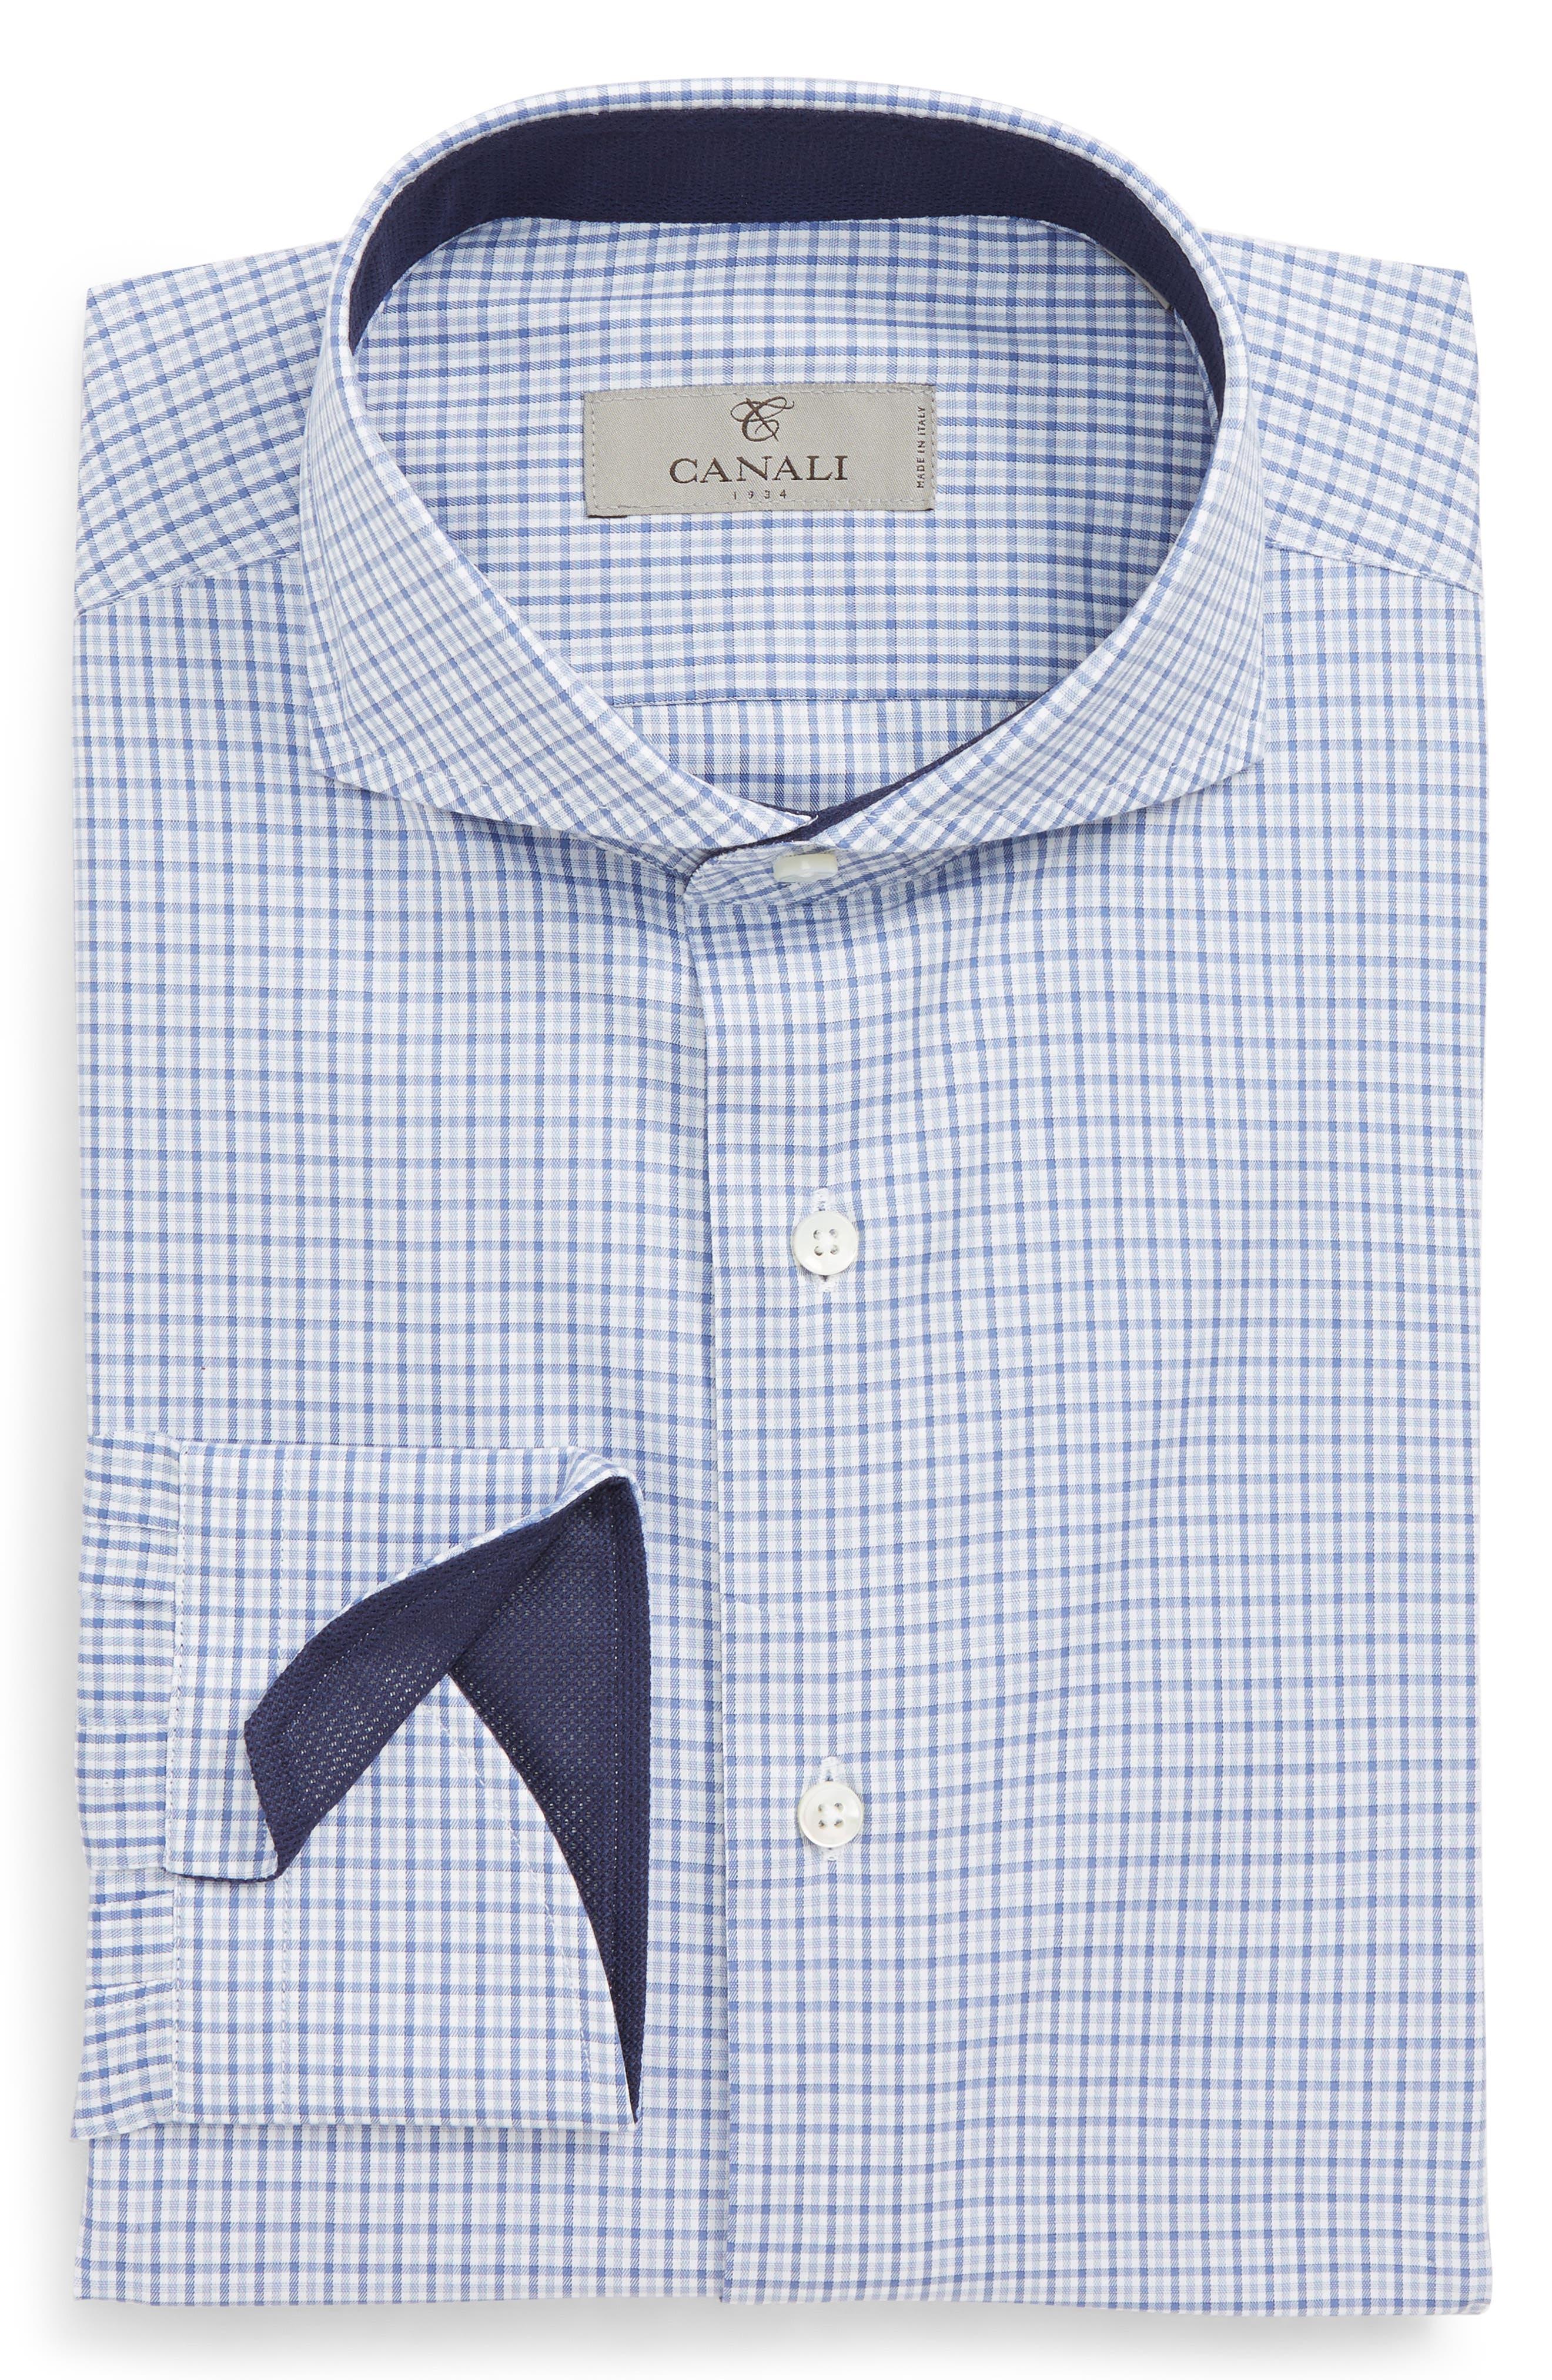 Regular Fit Check Dress Shirt,                             Alternate thumbnail 6, color,                             Medium Blue